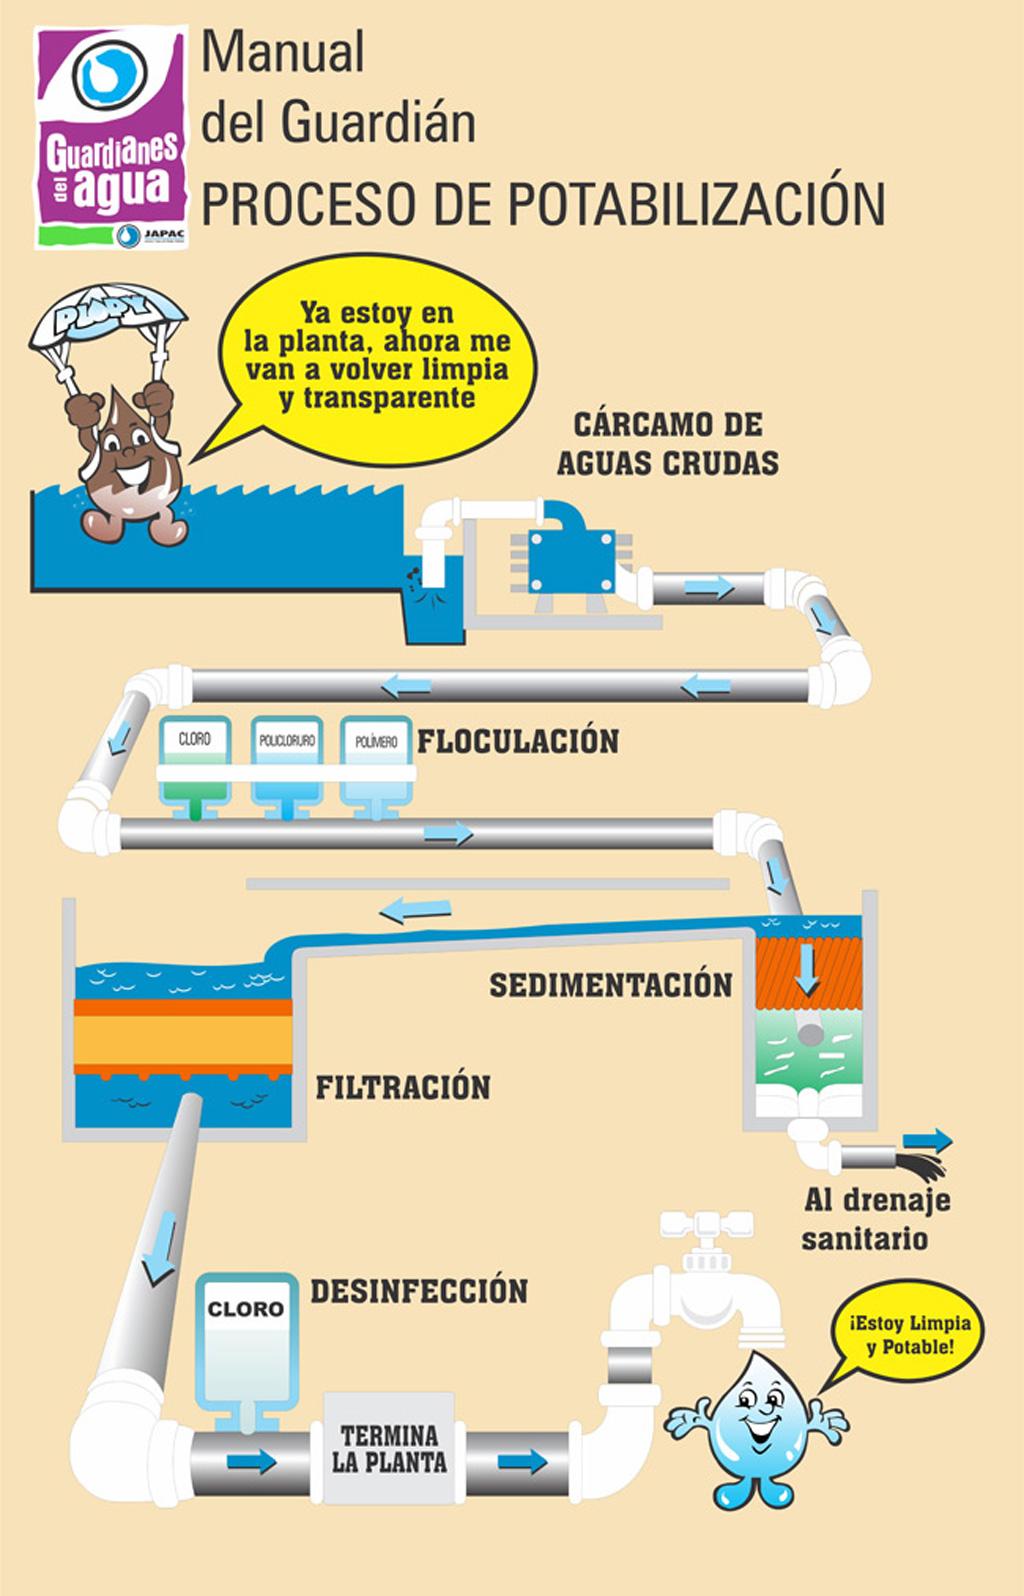 Cultura_del_Agua_Proceso_de_potabilizacion